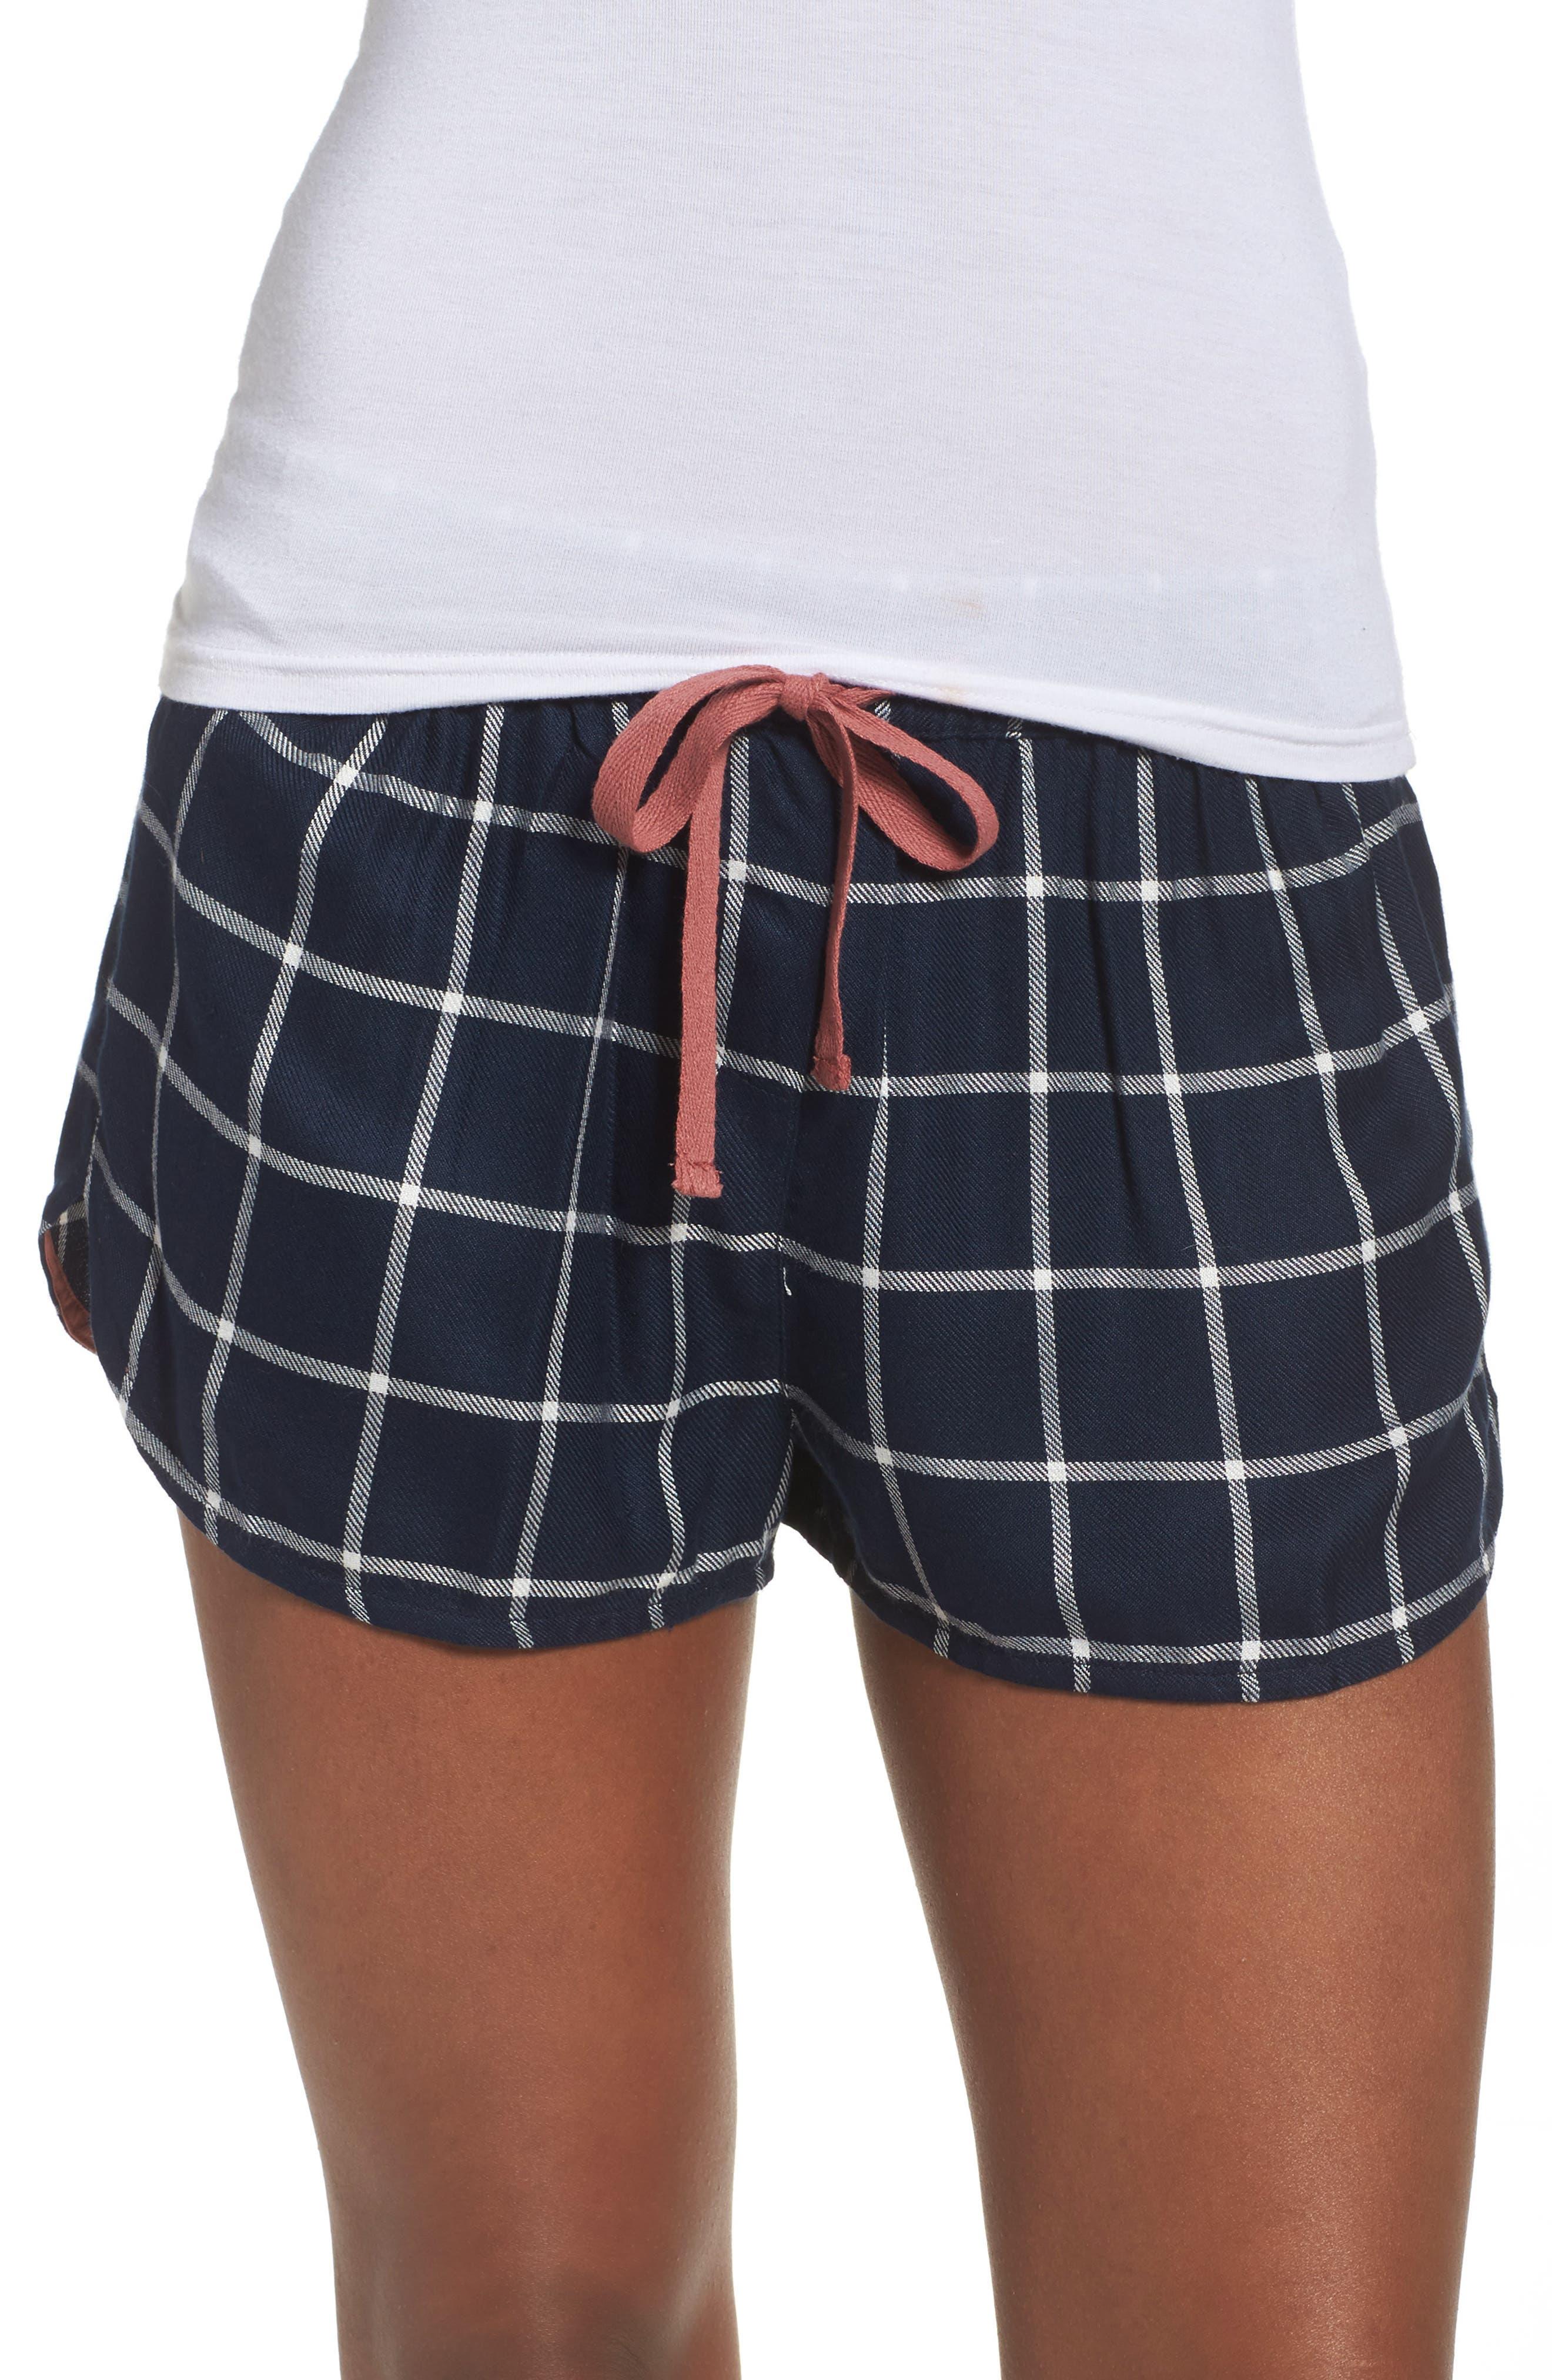 Alternate Image 1 Selected - Topshop Windowpane Check Pajama Shorts